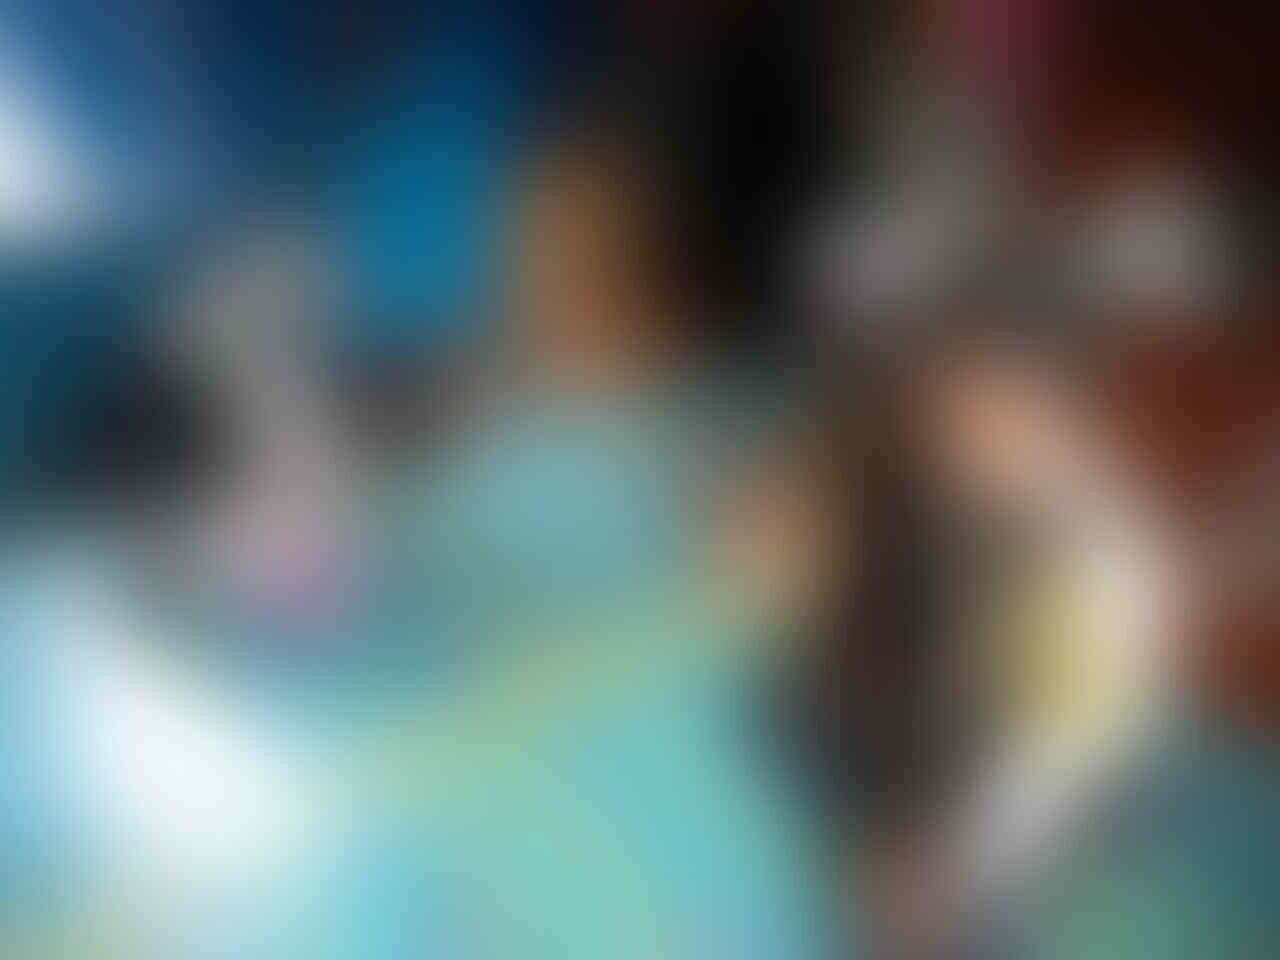 Penderita Cerebral Palsy di Lakukan Cek Pengecekan Oleh Satgas Nusantara